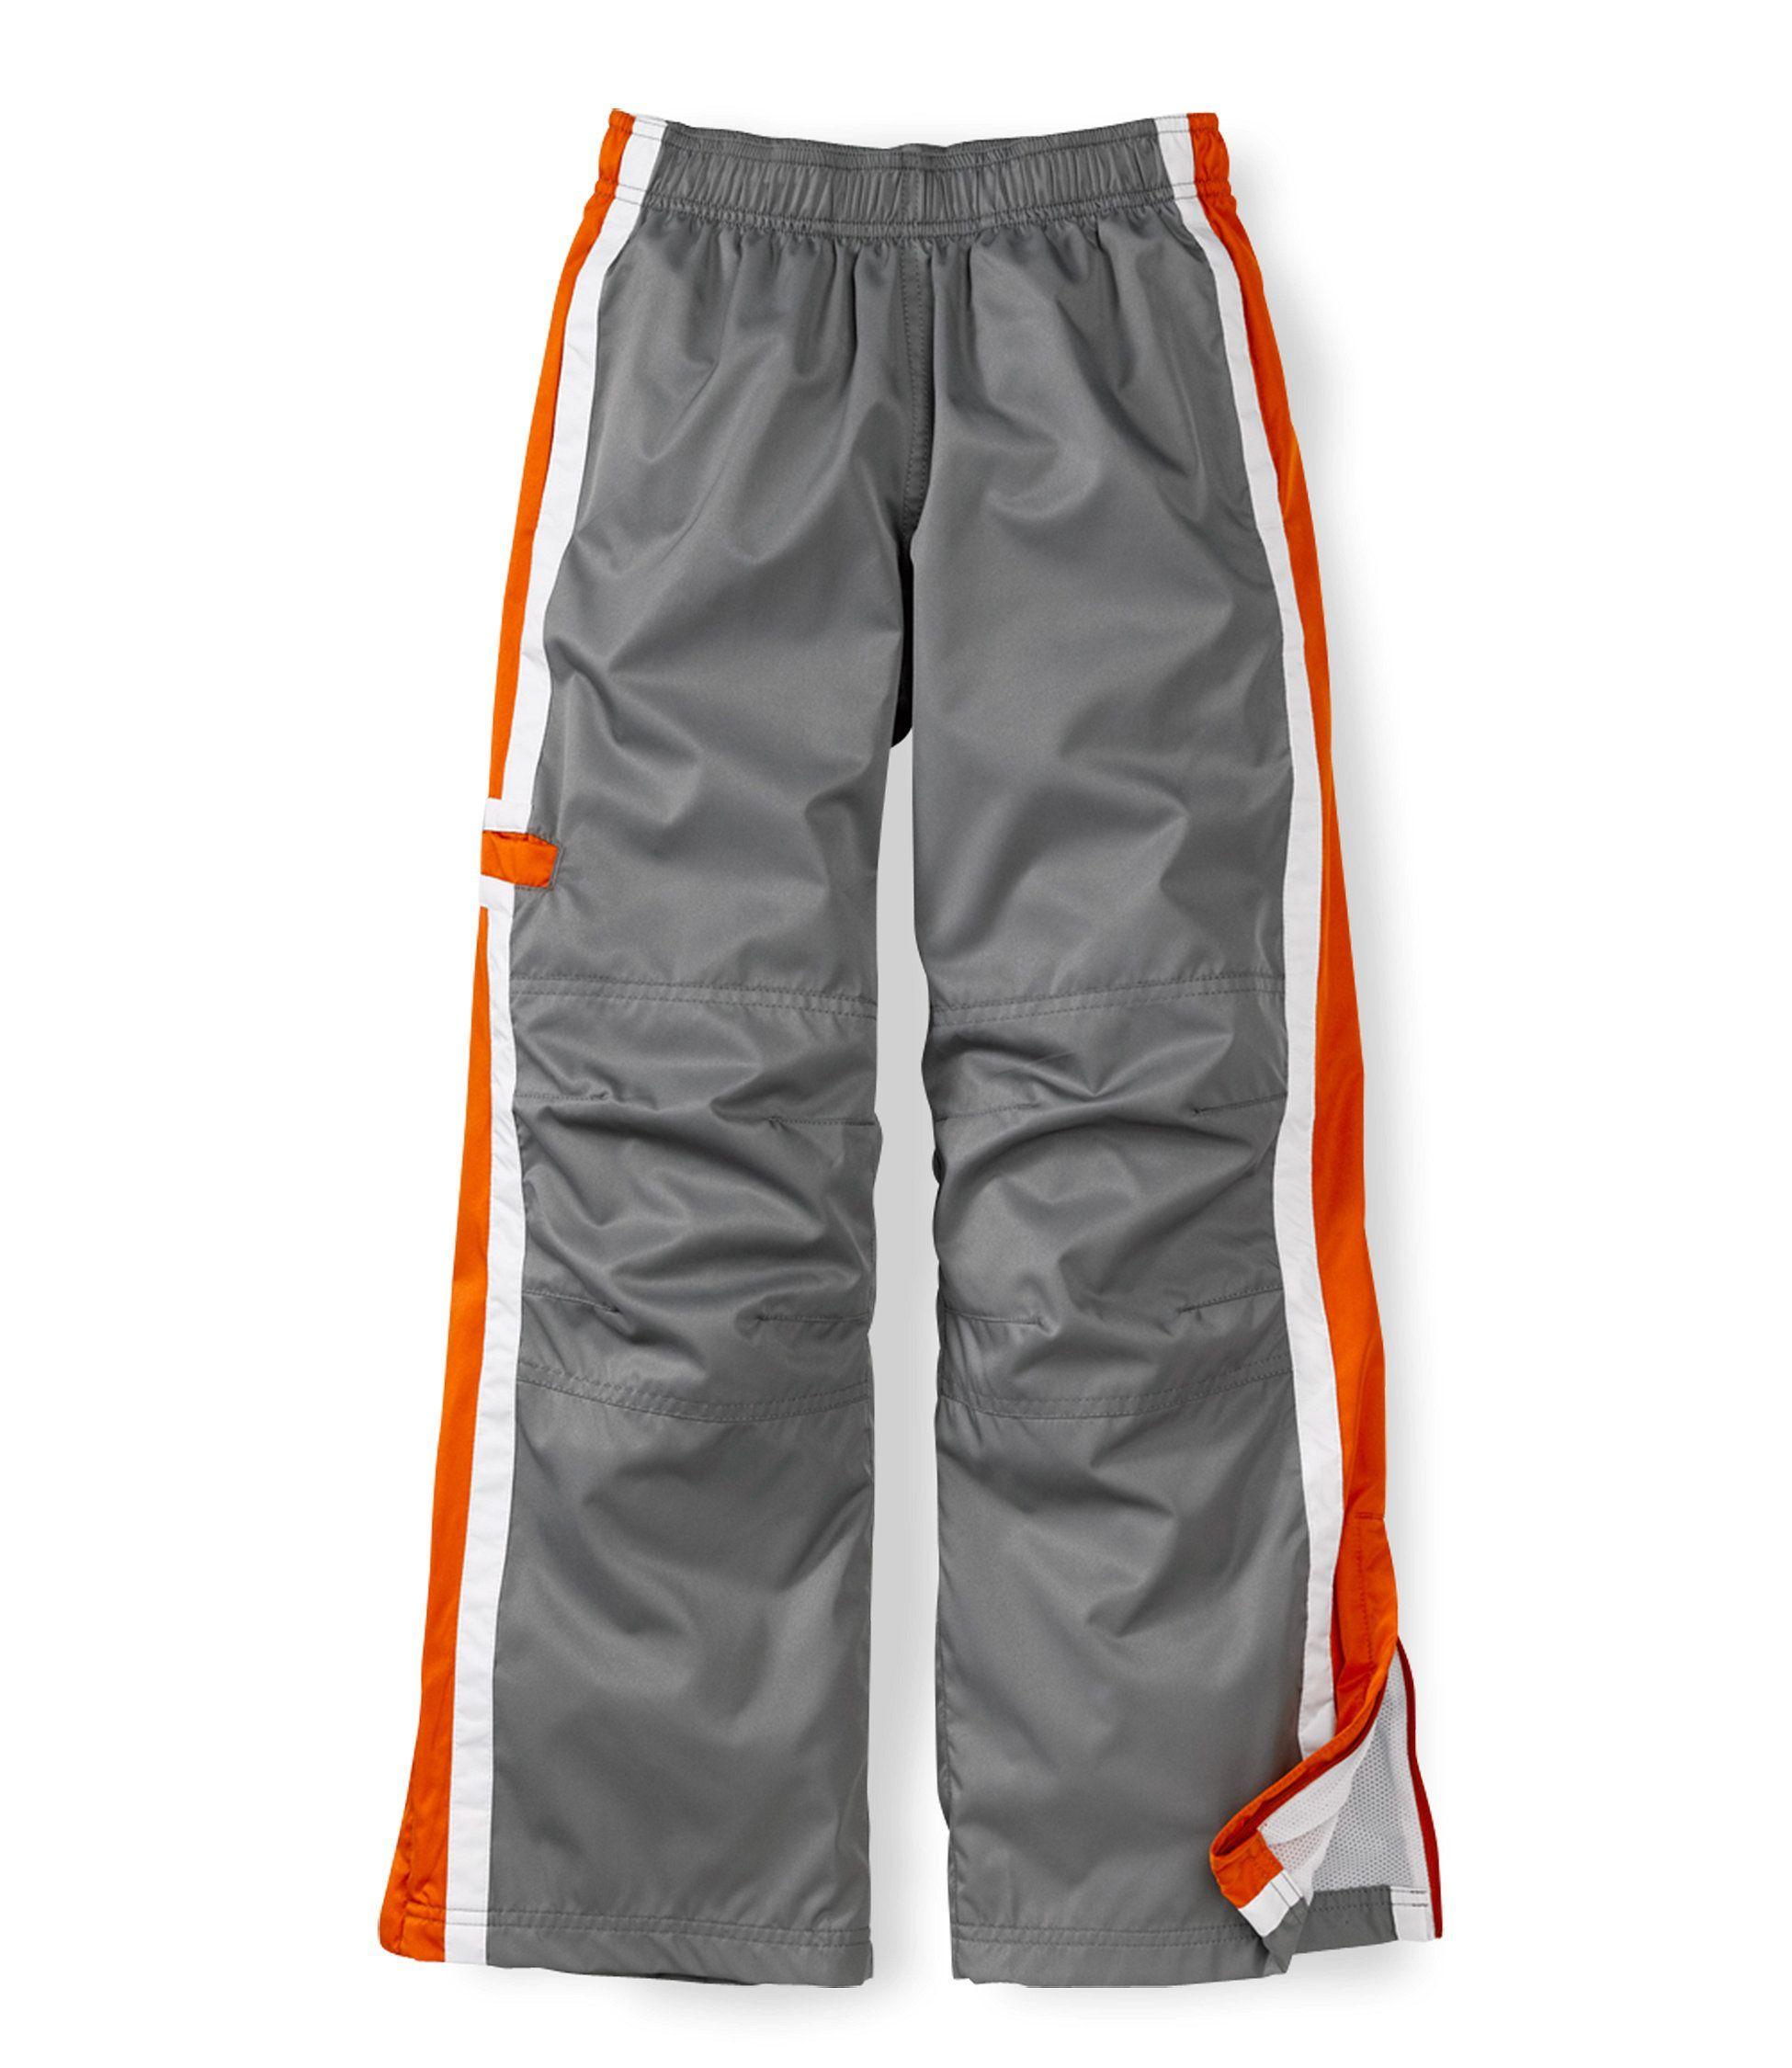 Kids athletic pants kids athletic clothes kids